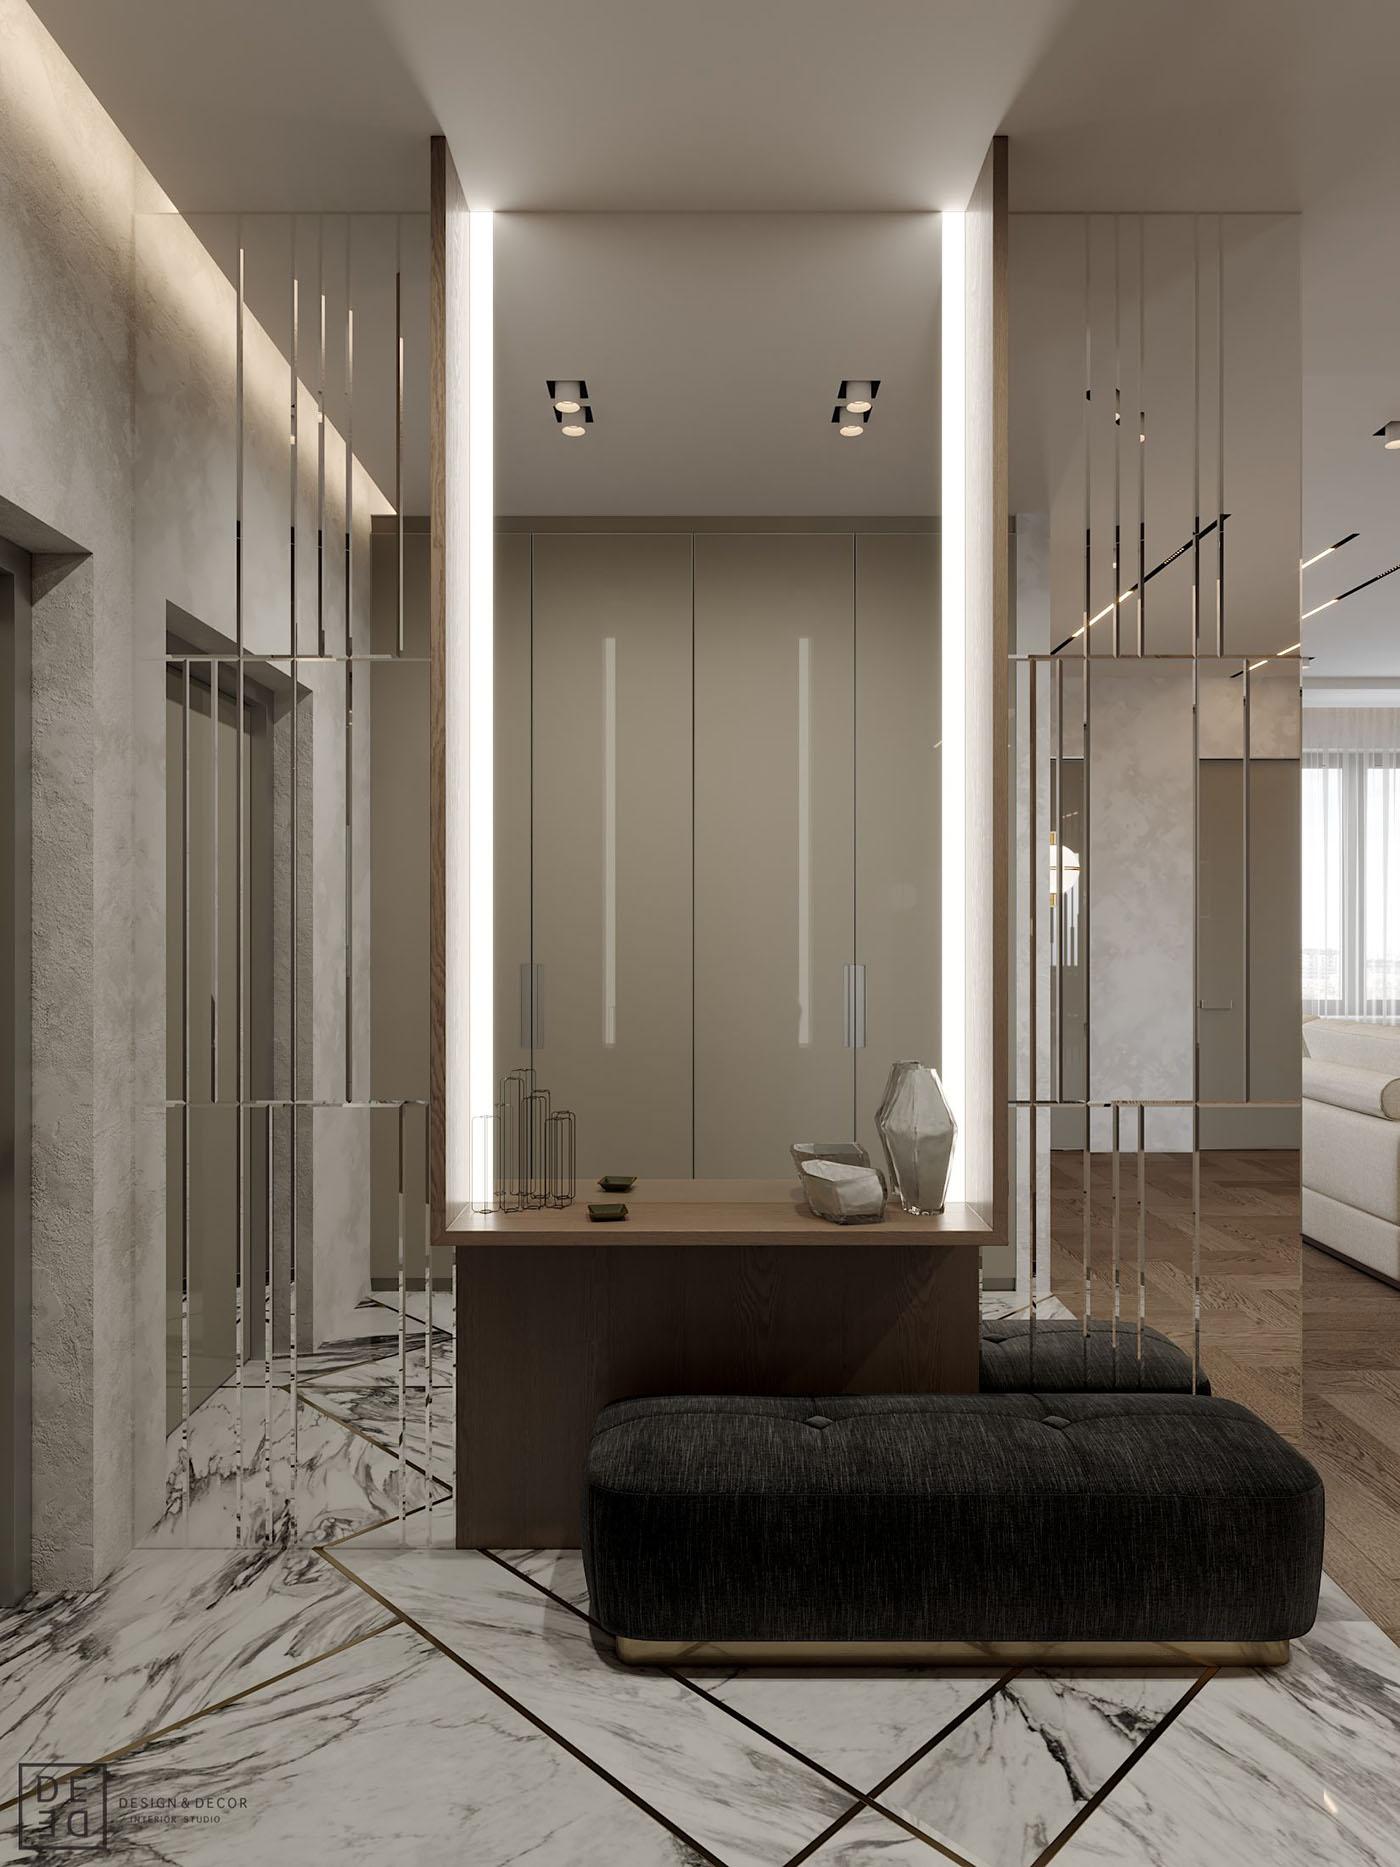 Interior design interiordesign Minimalism modern DE&DE Interior Studio designer corona render  photoshop 3ds max